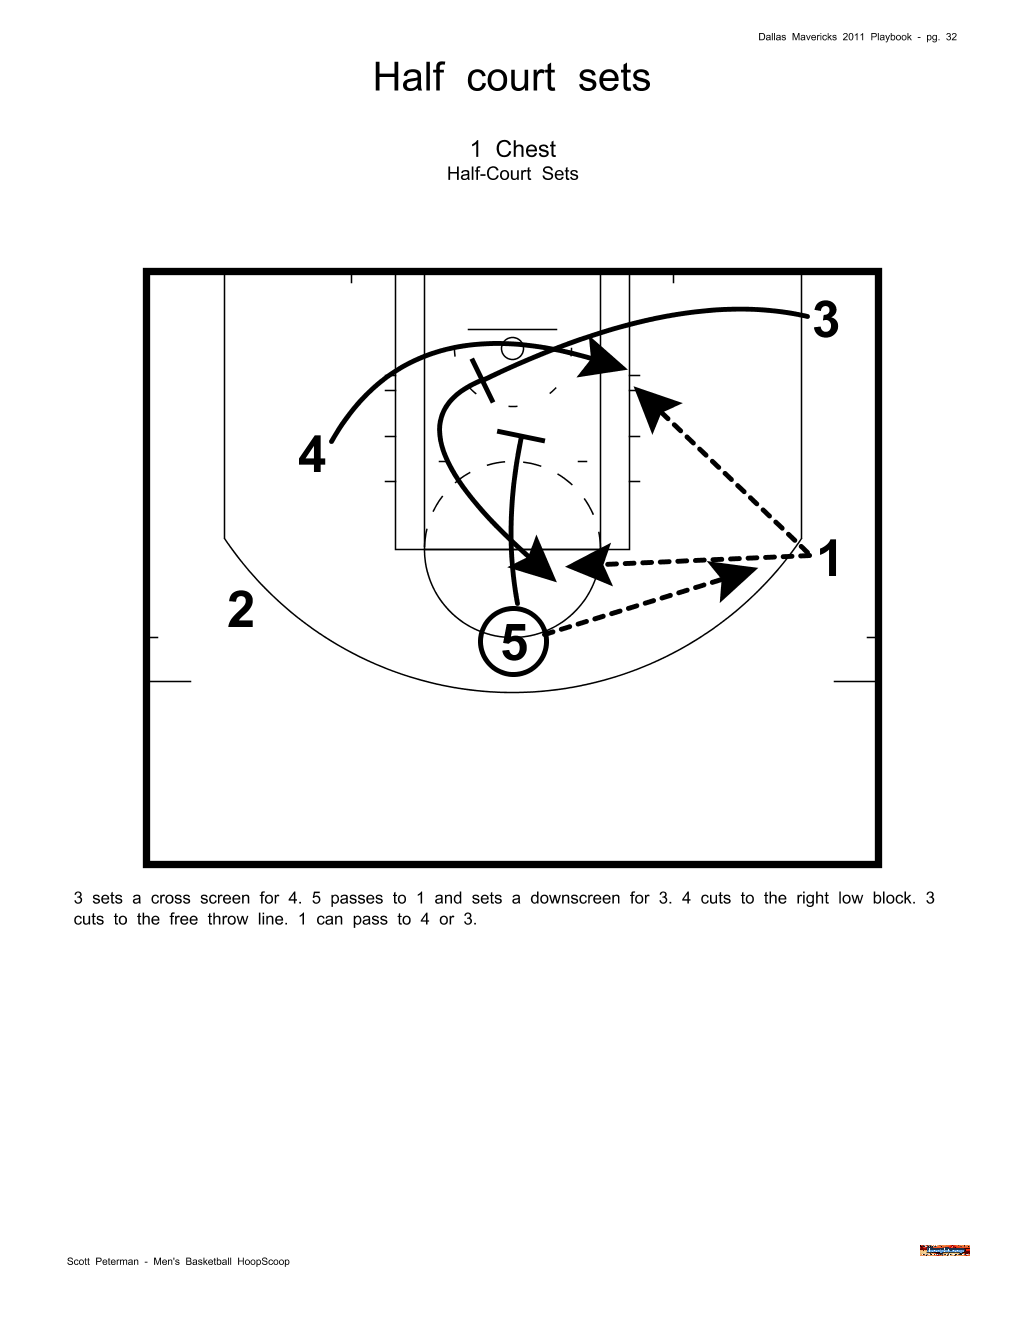 NBA Dallas Mavericks Playbook  4c0652947